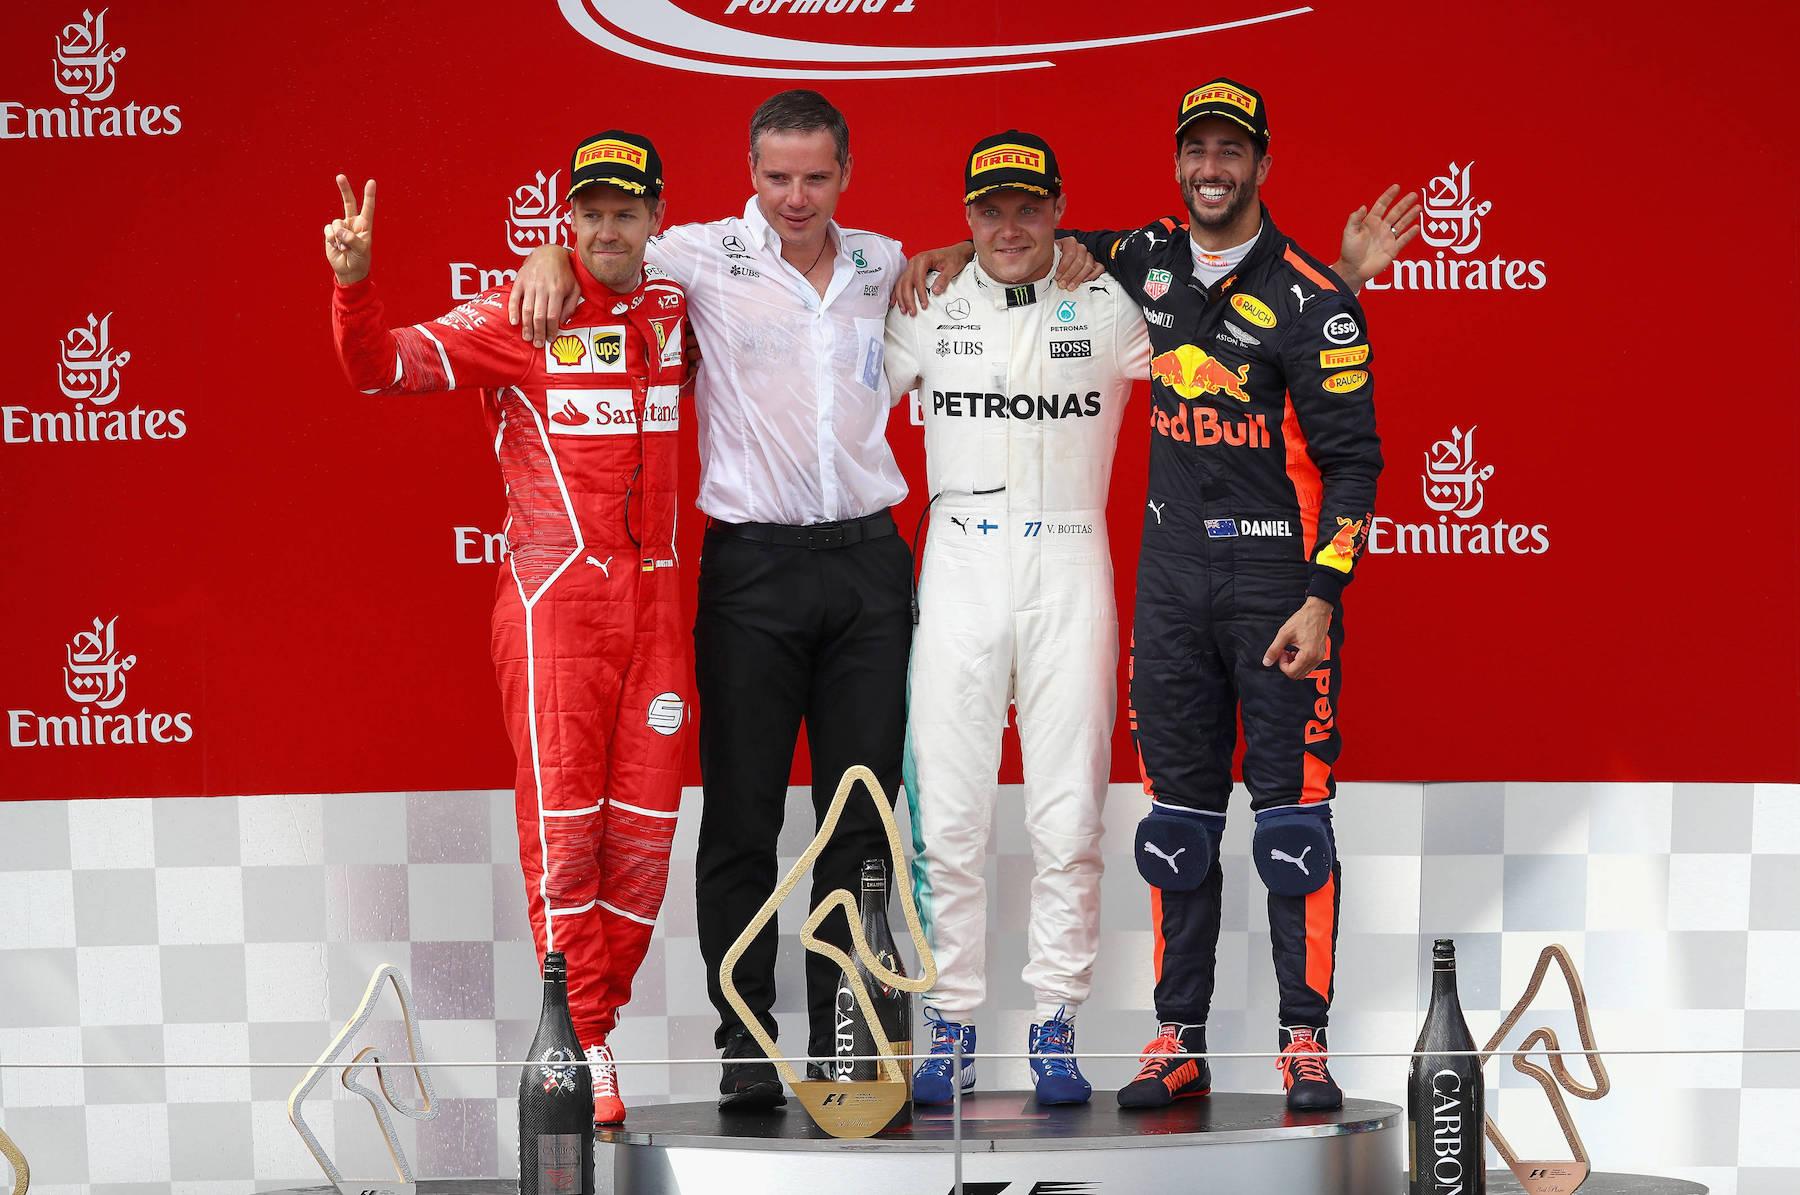 X 2017 Austrian GP podium 1 copy.jpg